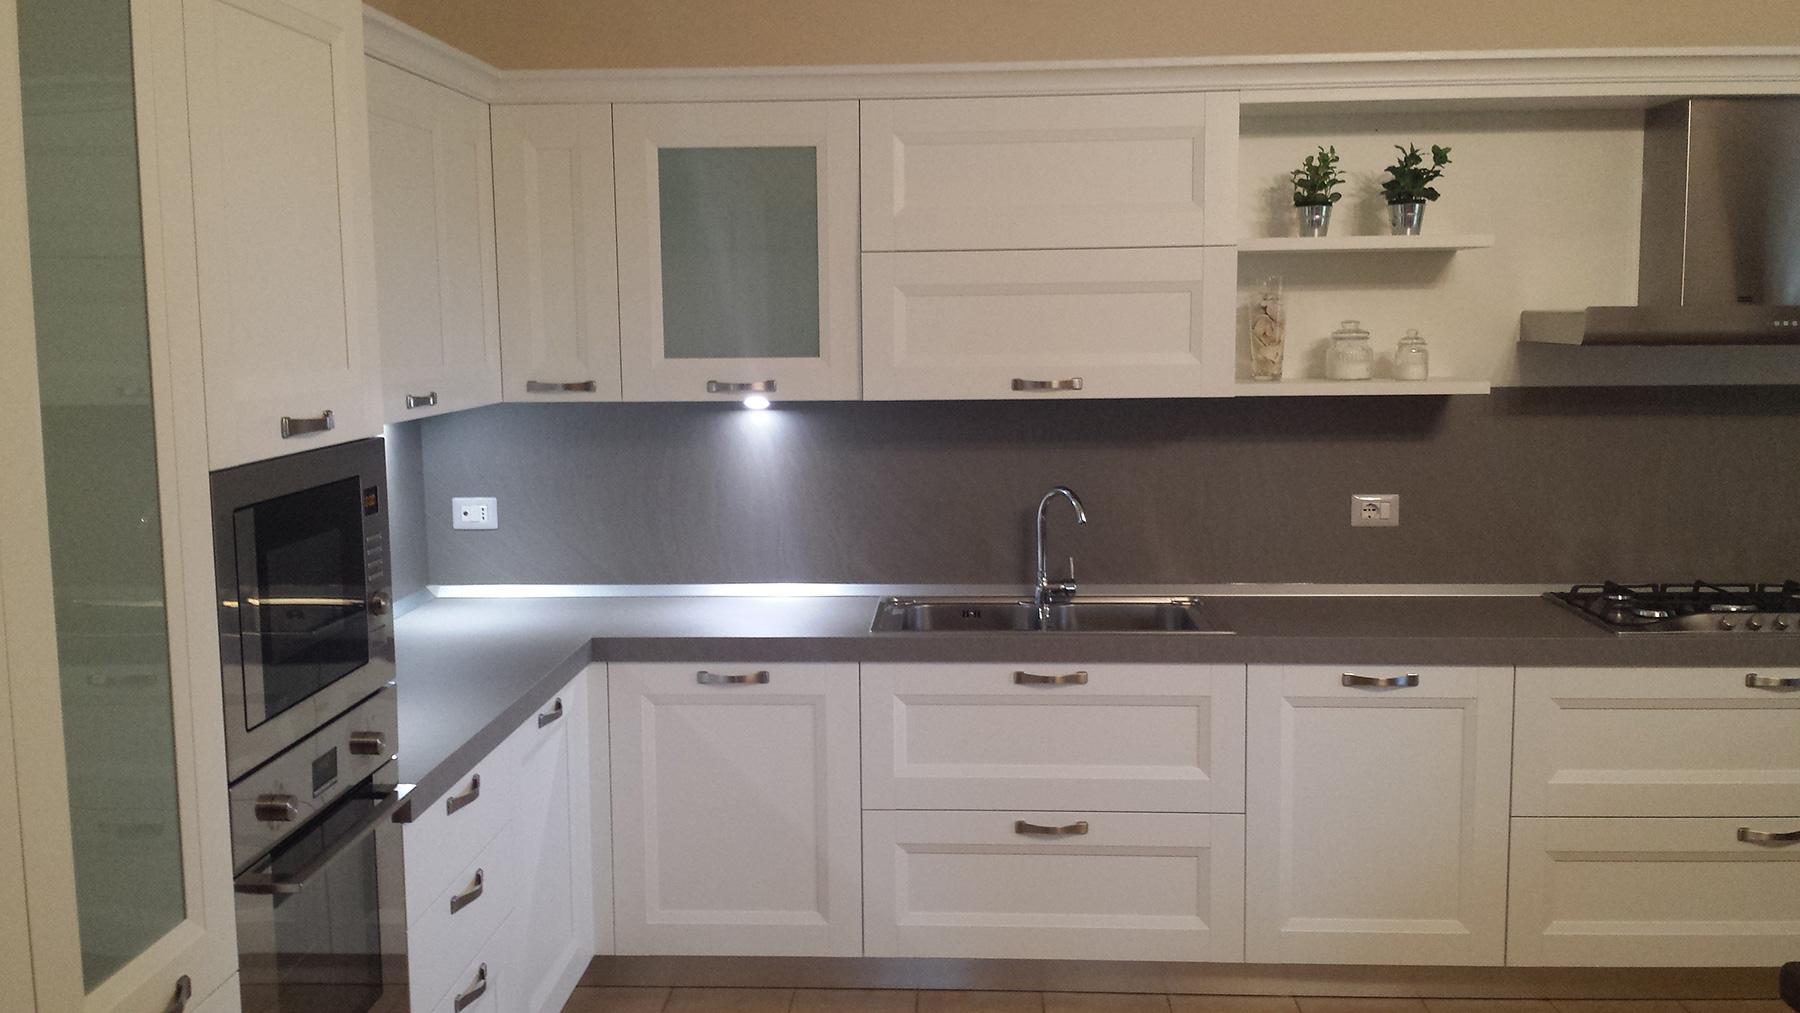 abitazione privata a pederiva di montebelluna cucina